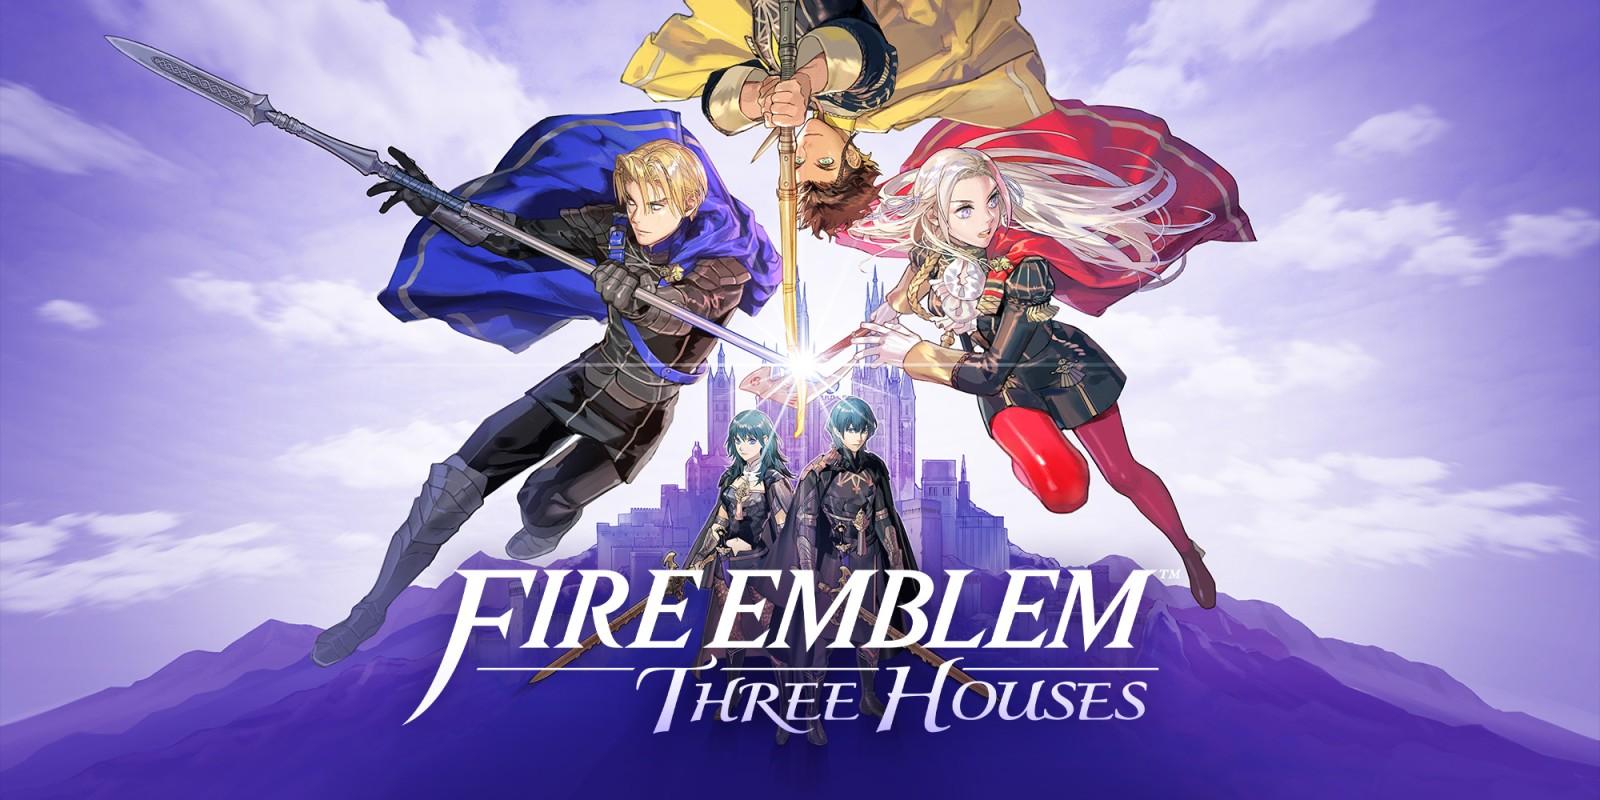 Fire Emblem, Three Houses, Nintendo Switch